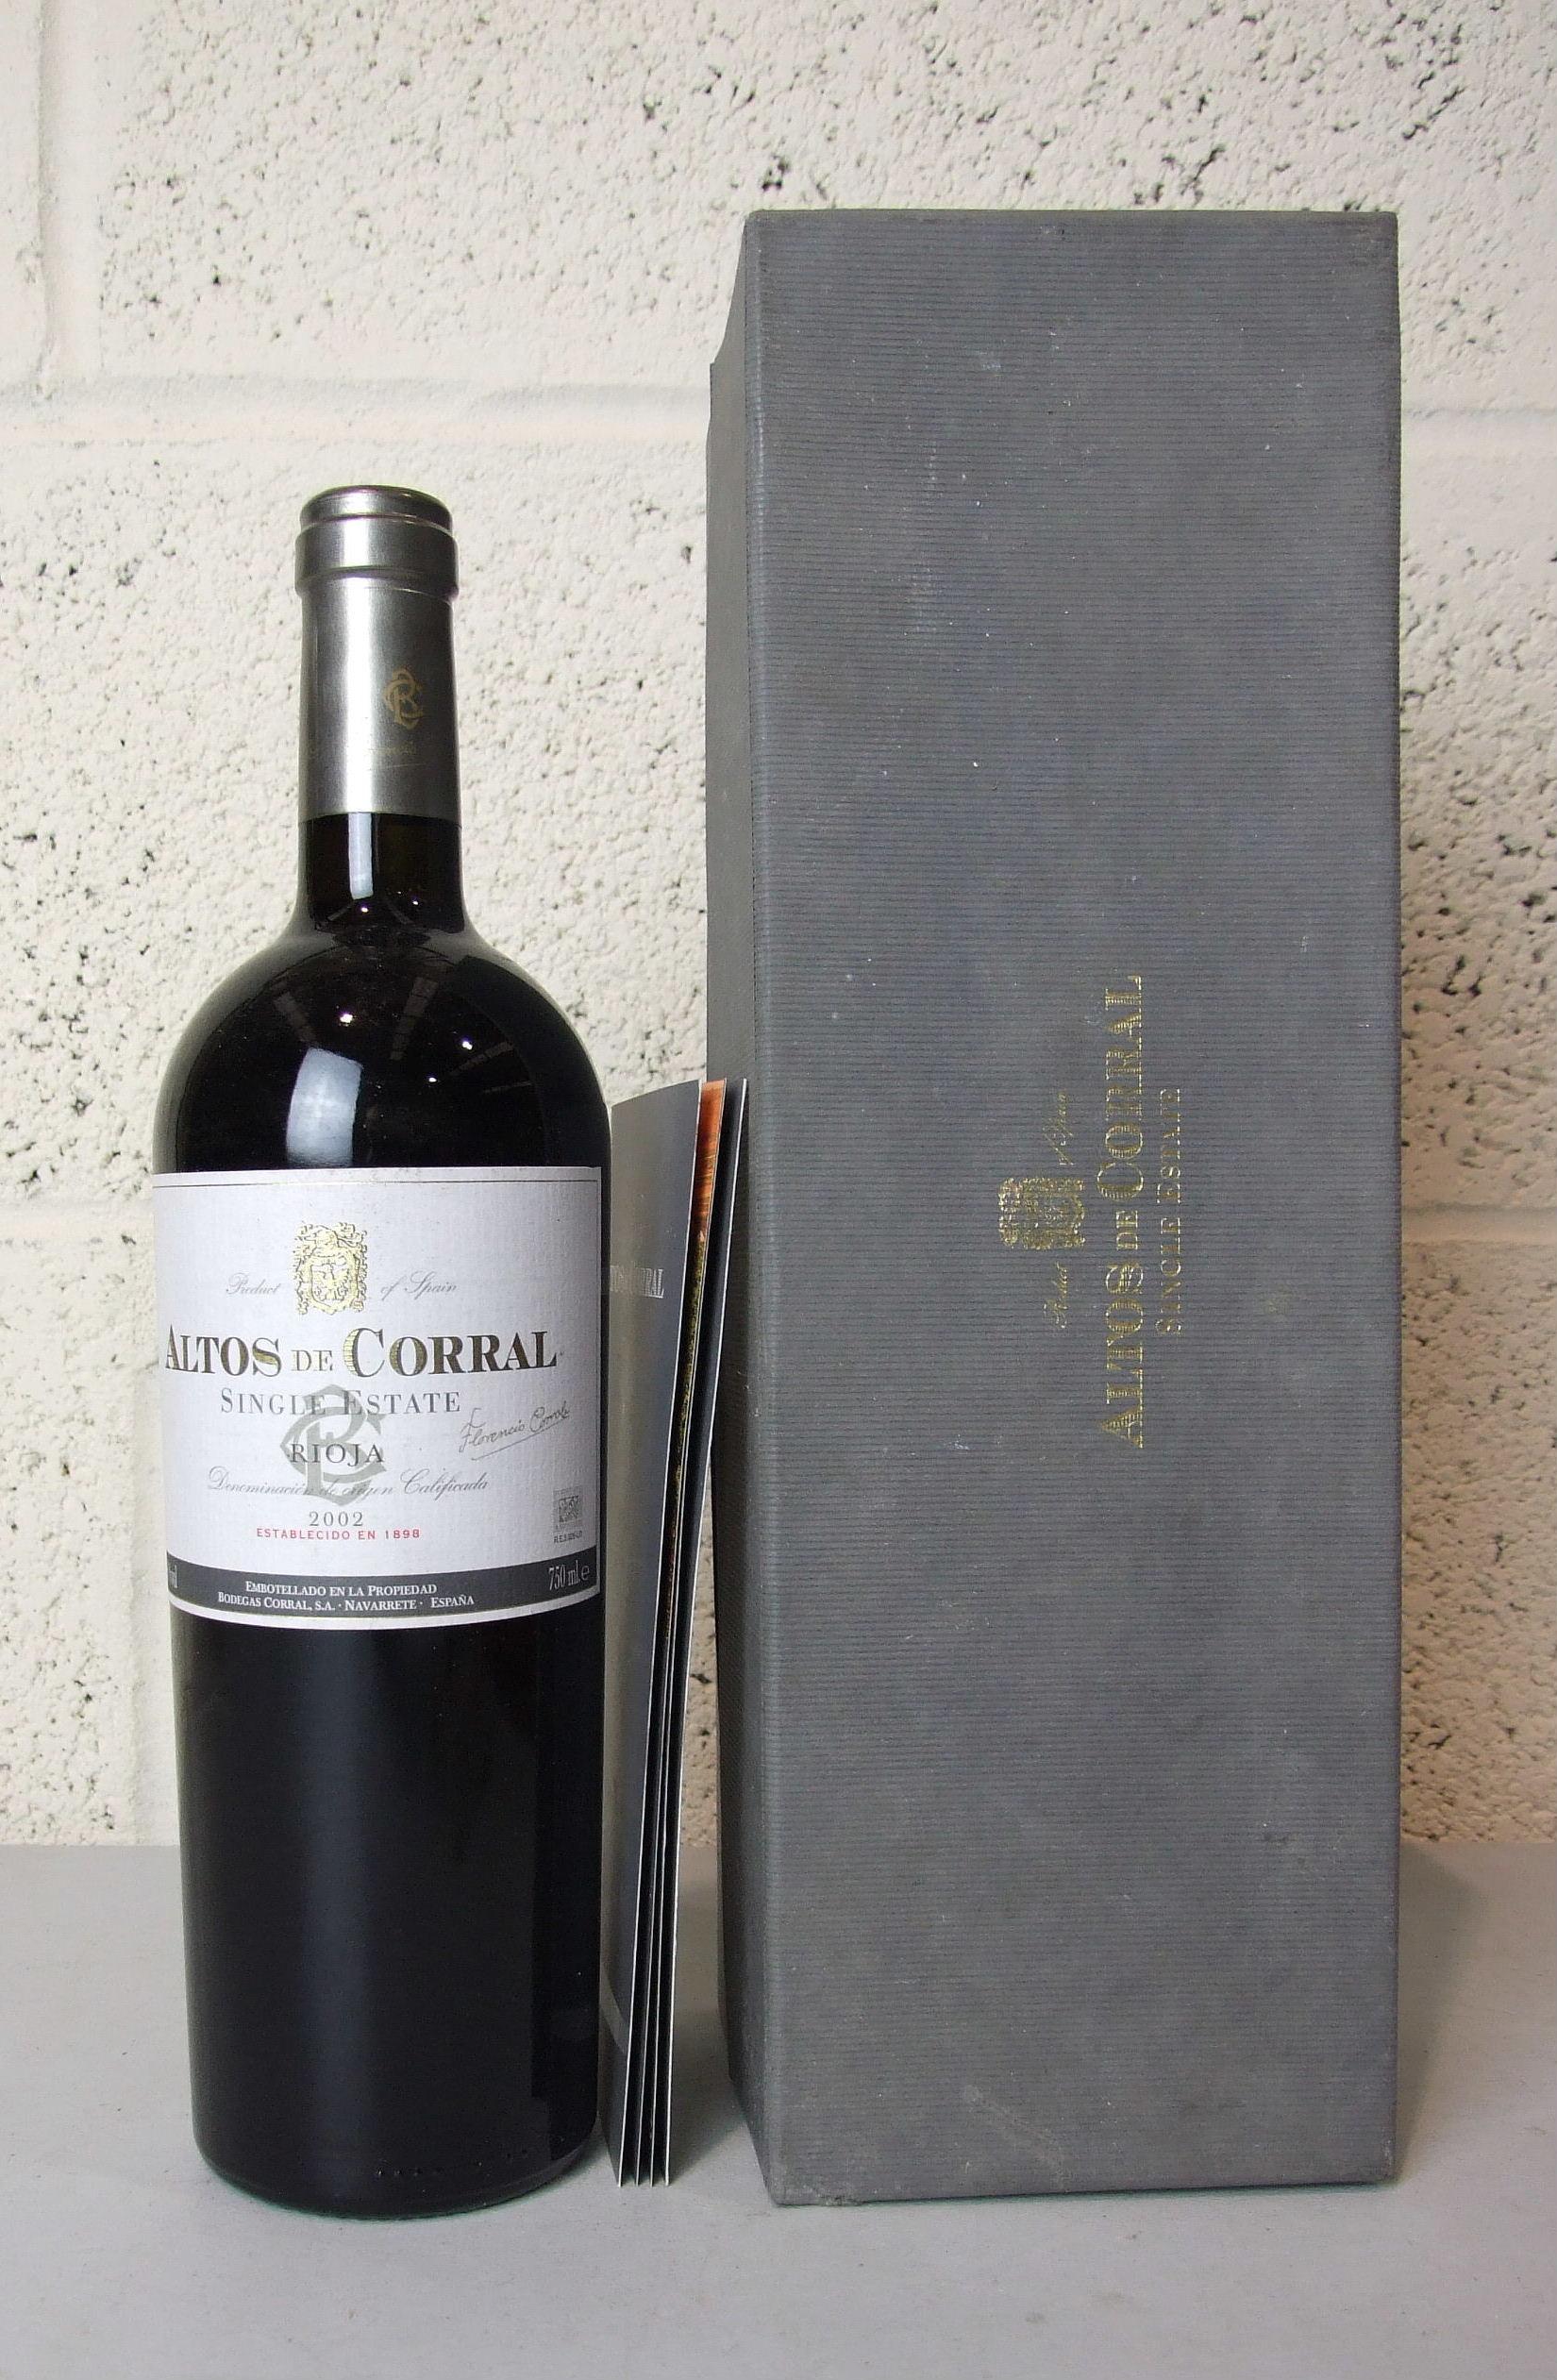 Lot 43 - Spain, Rioja Altos de Corral single estate 2002, one magnum, (1).